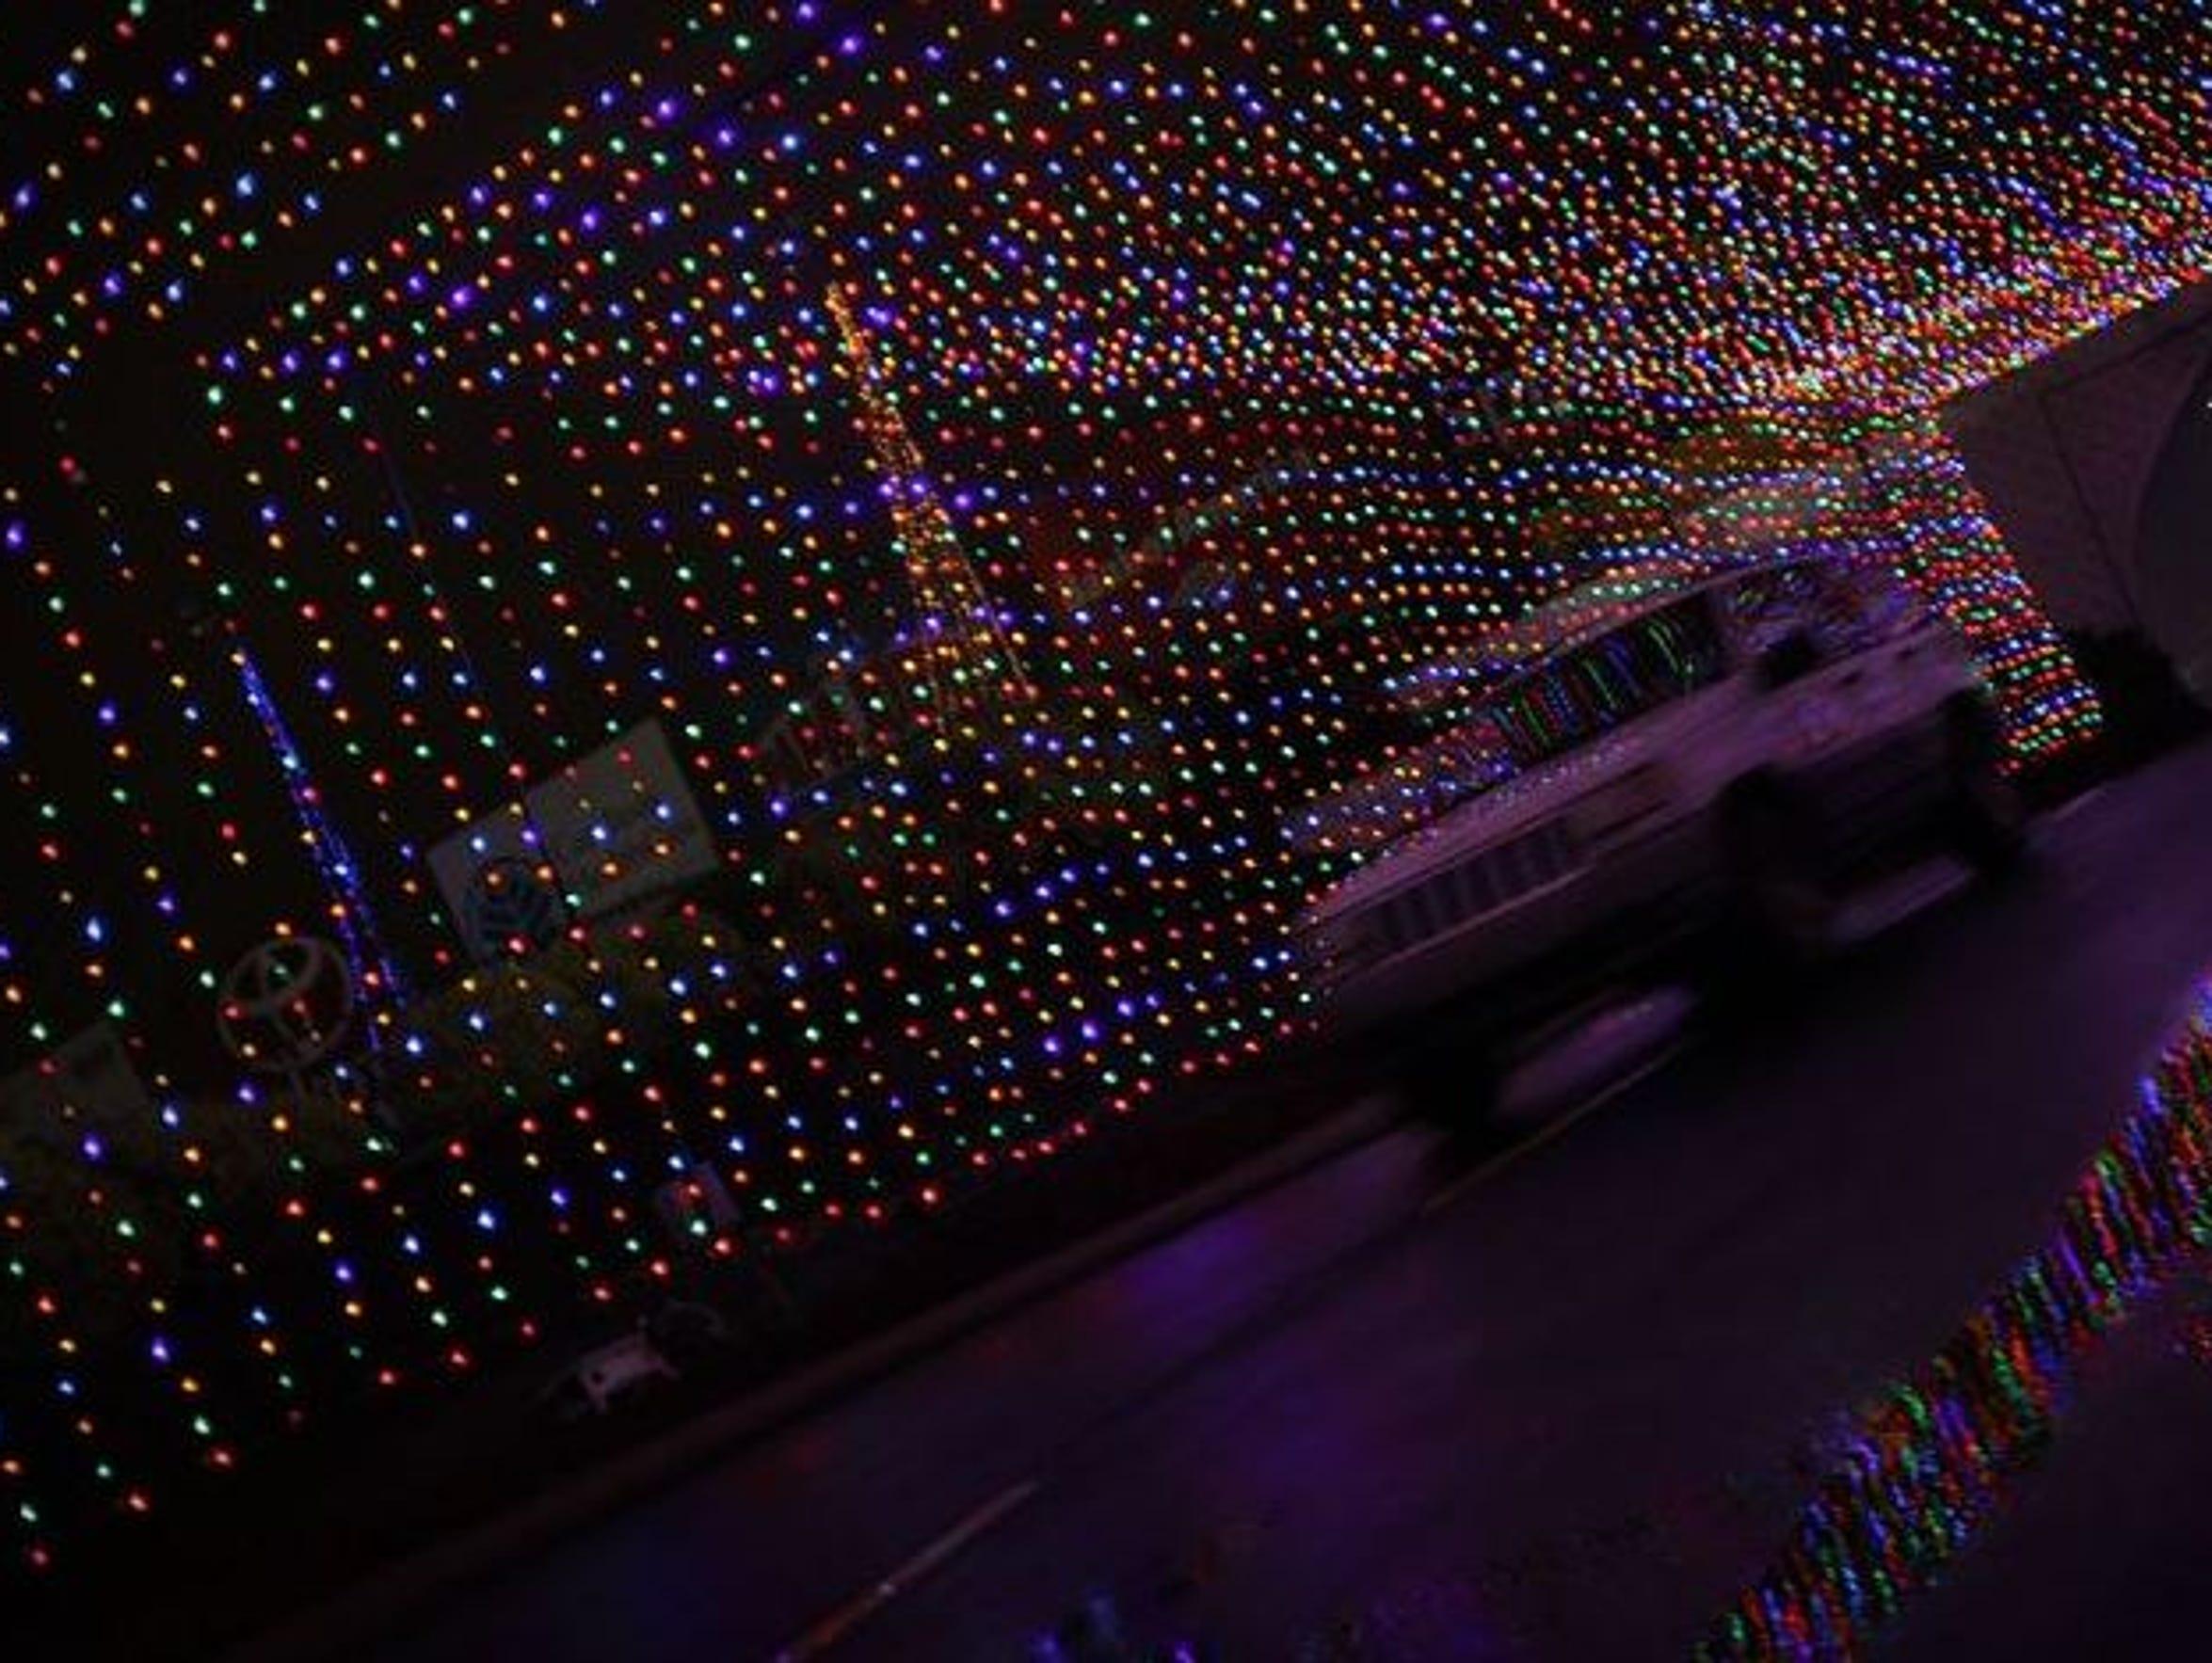 Nc popular holiday light displays to visit for Charlotte motor speedway christmas lights nc